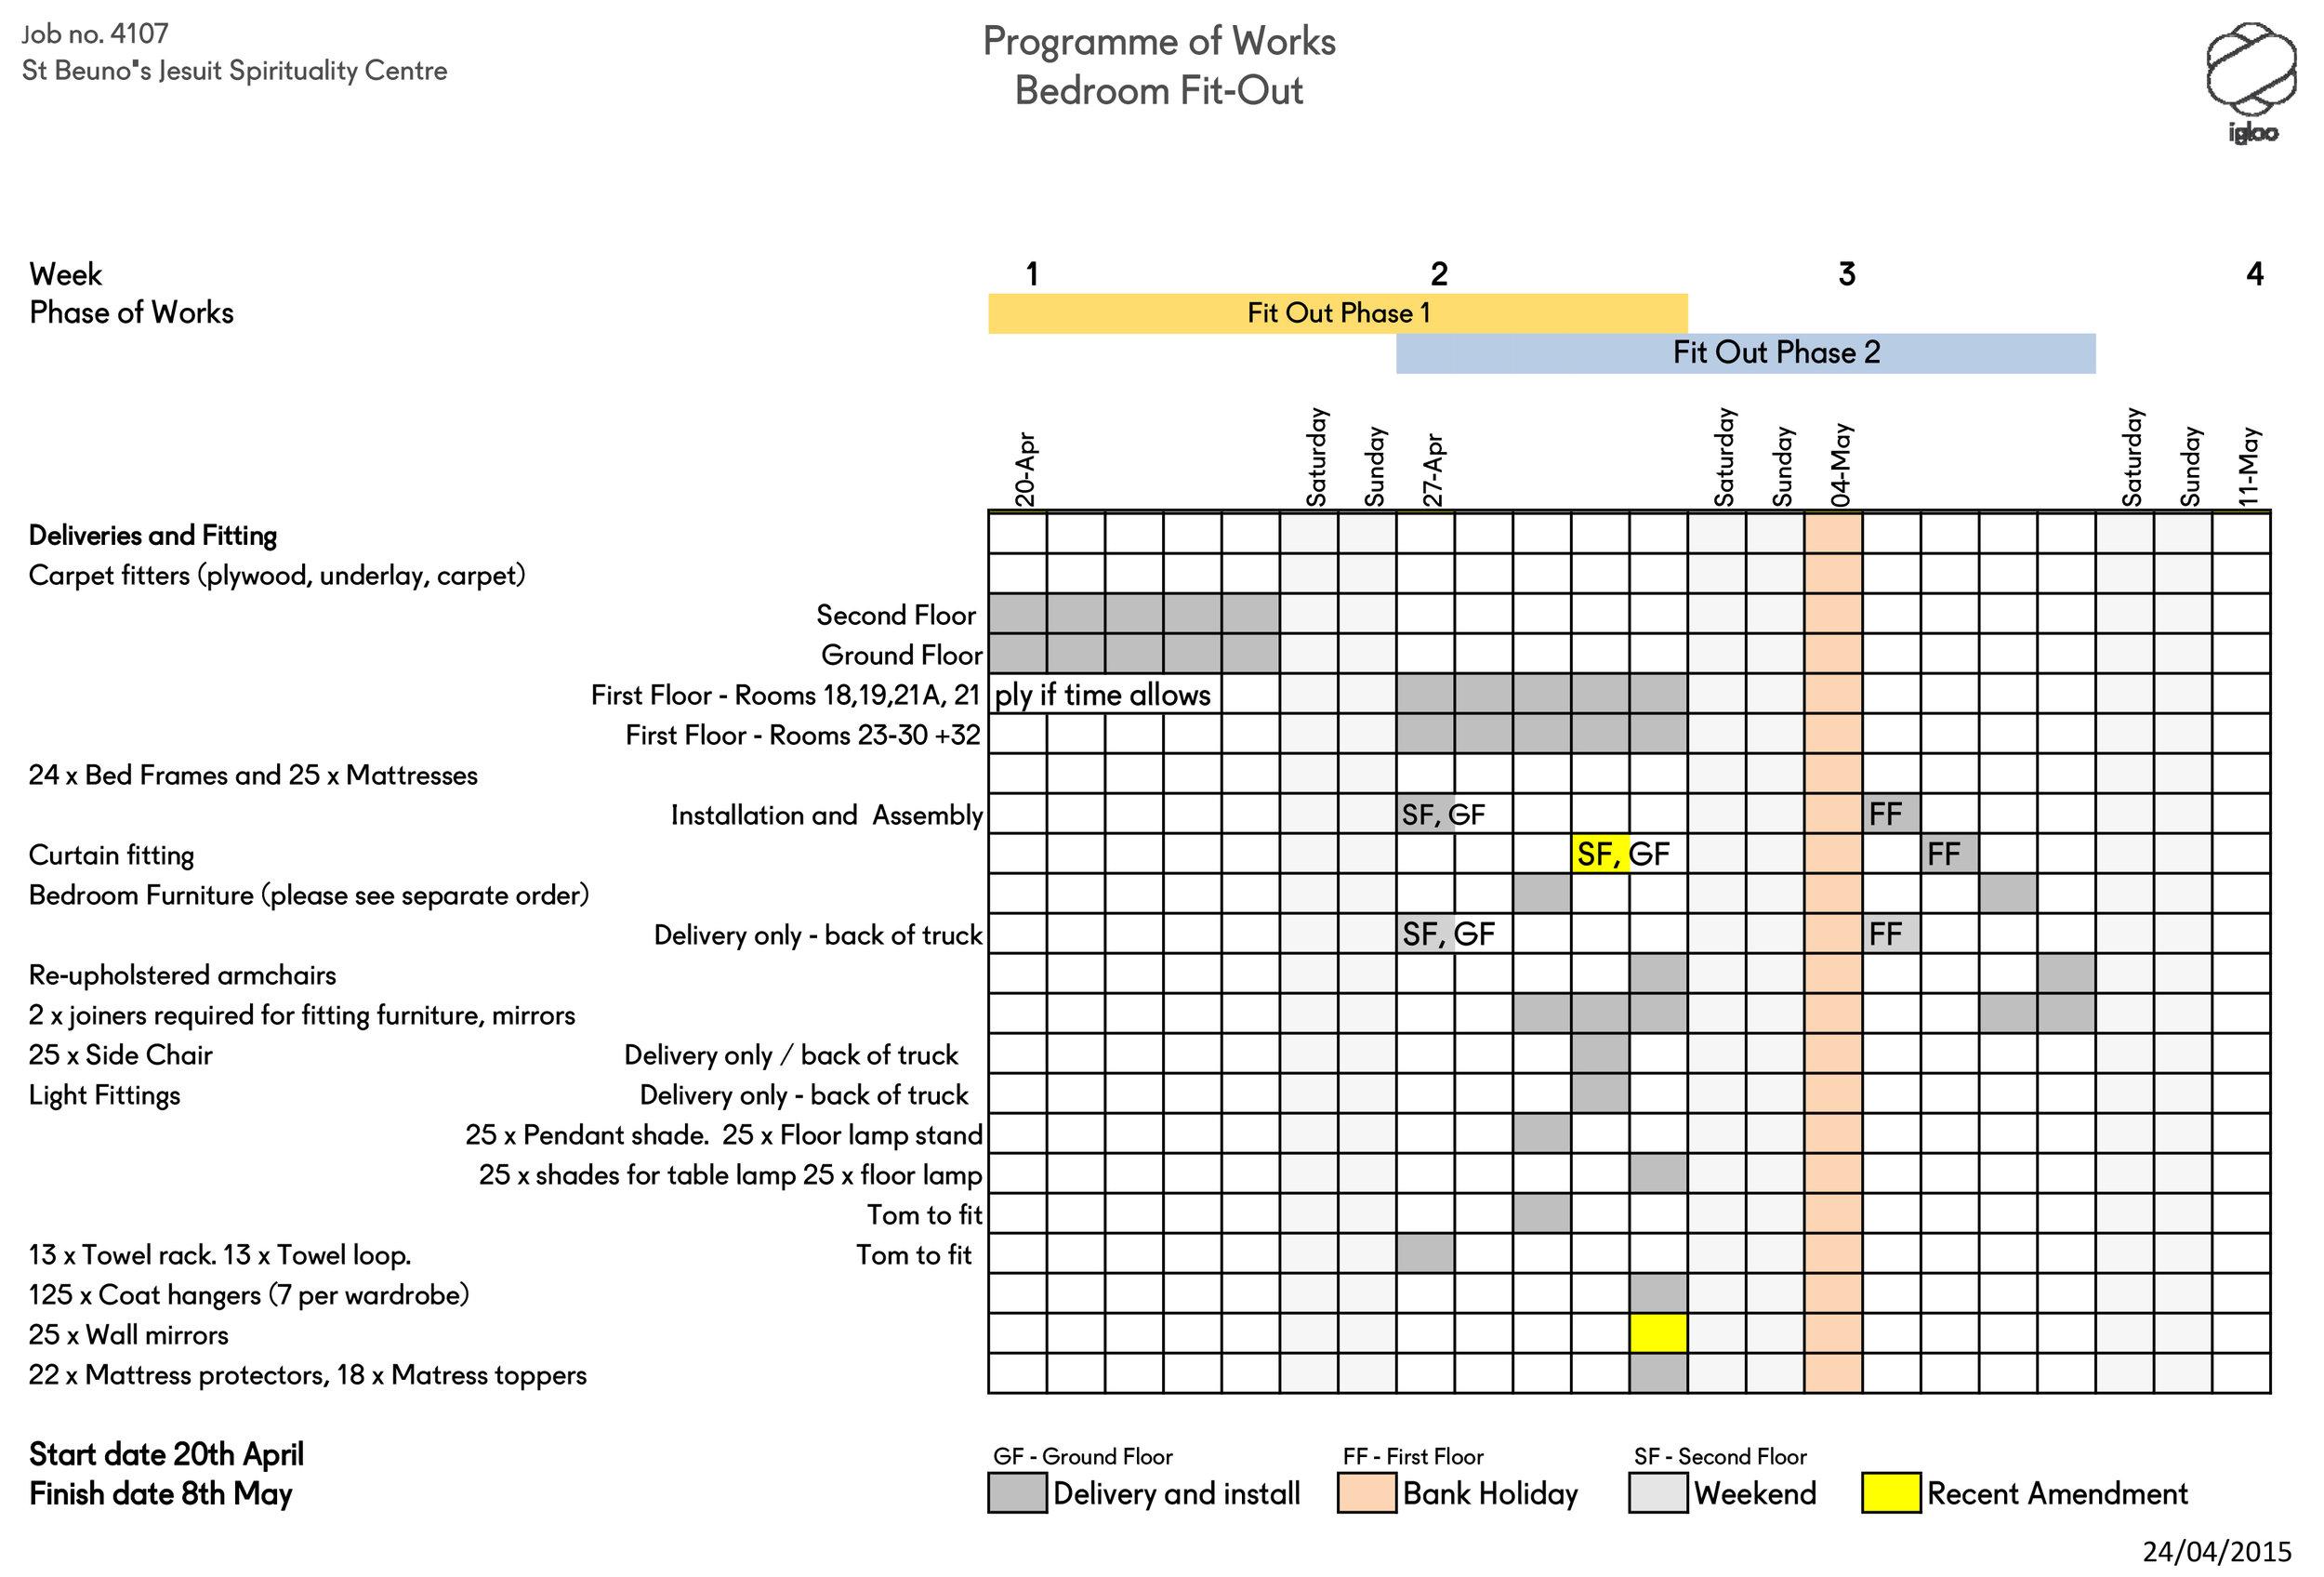 Programme of Works.jpg